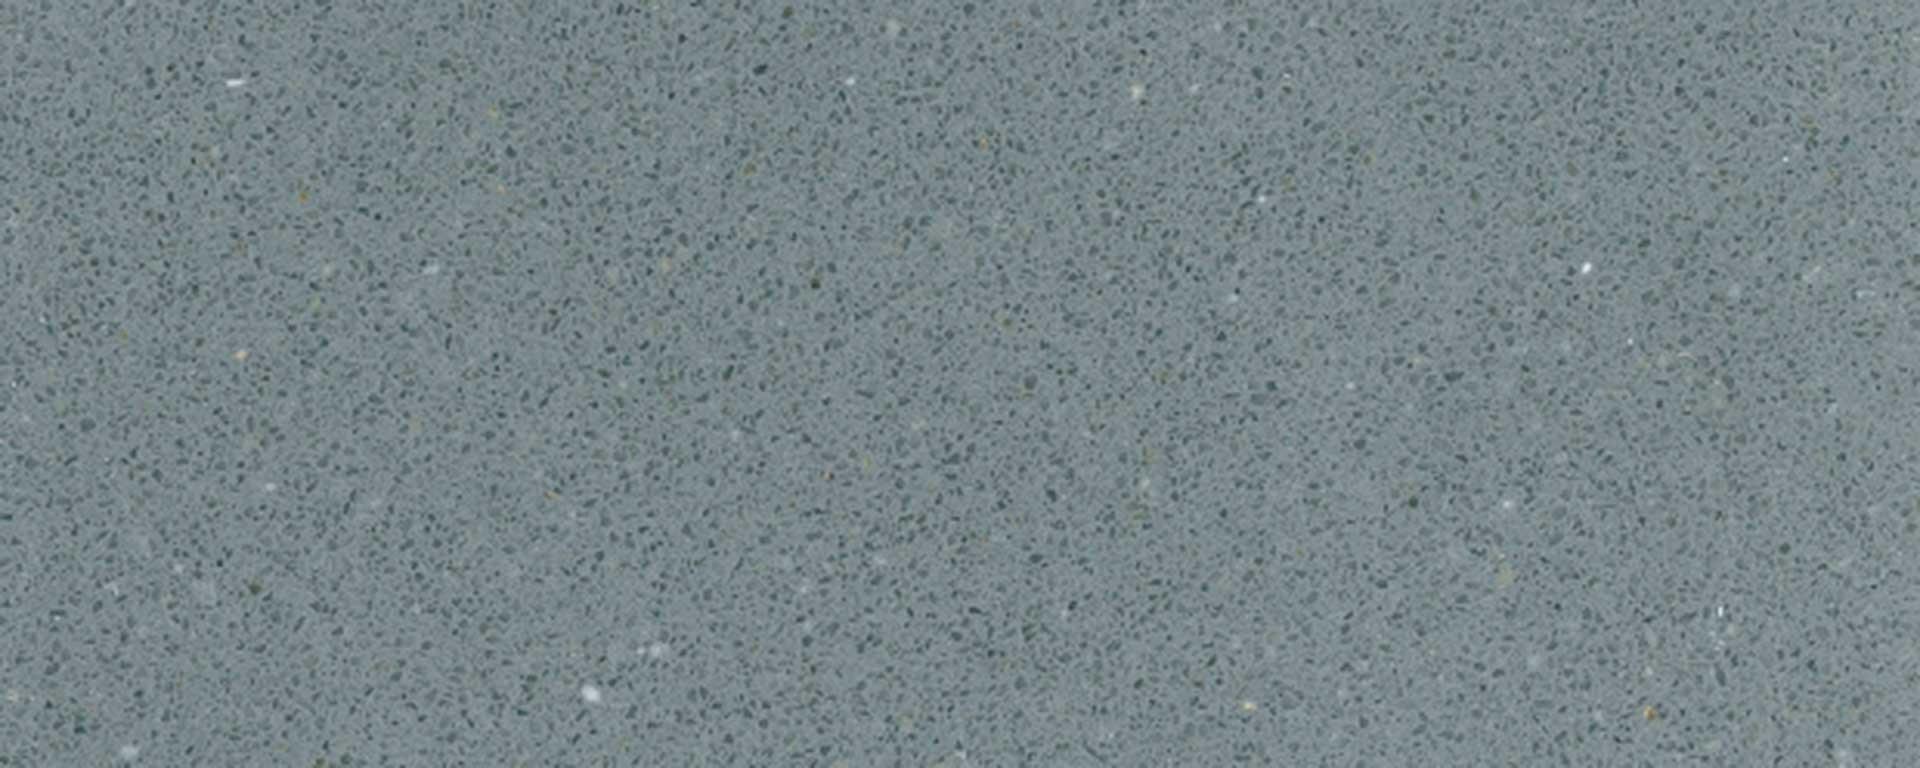 MMDR-007-terrazzo-marmo-resina-